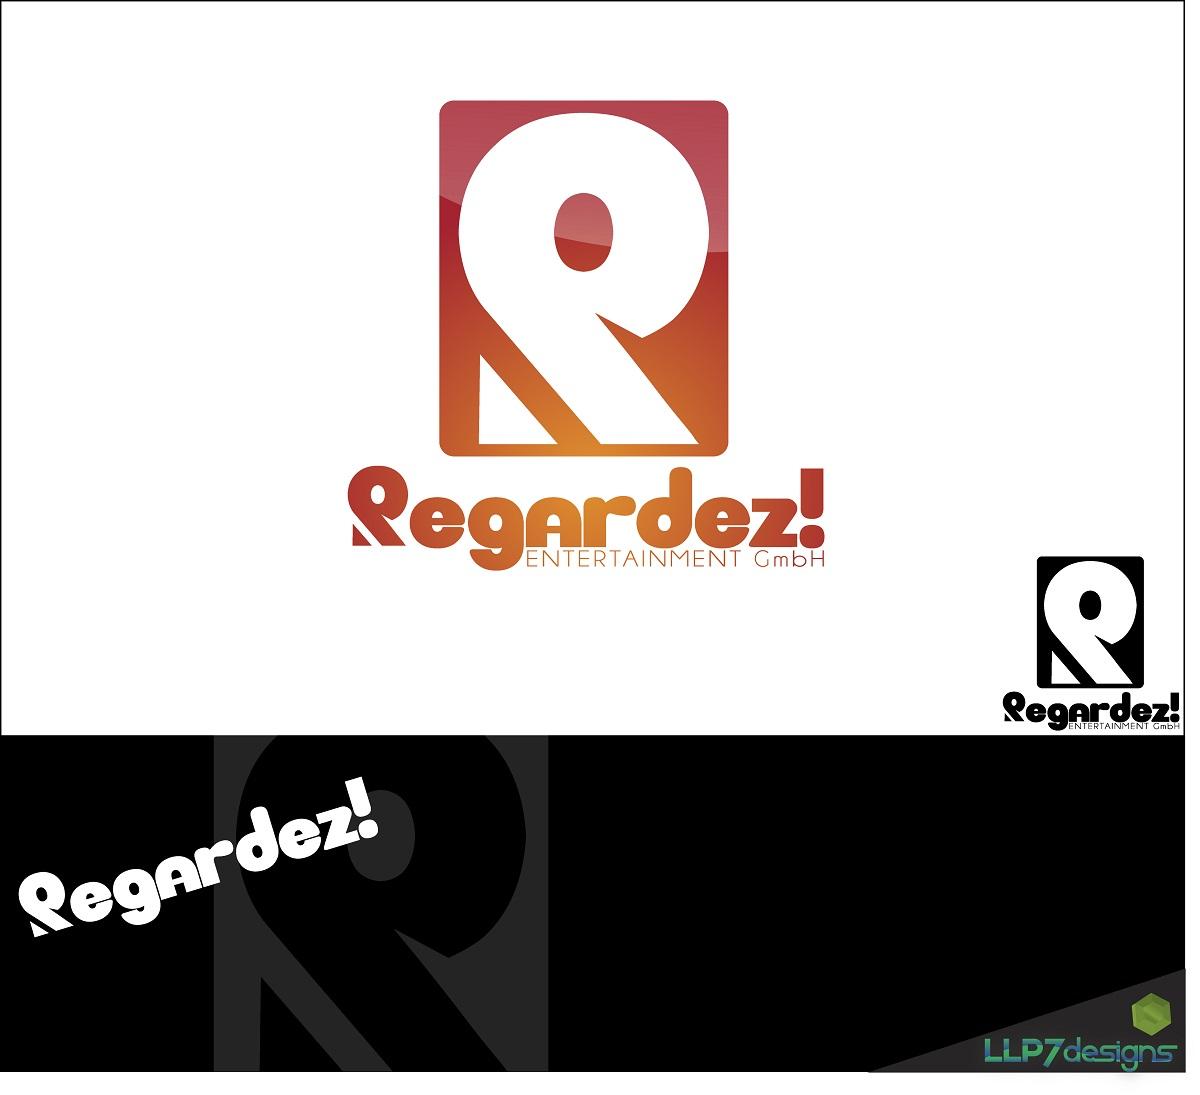 Logo Design by LLP7 - Entry No. 2 in the Logo Design Contest Logo Design Needed for Exciting New Company Regardez! (full name = Regardez! Entertainment GmbH).